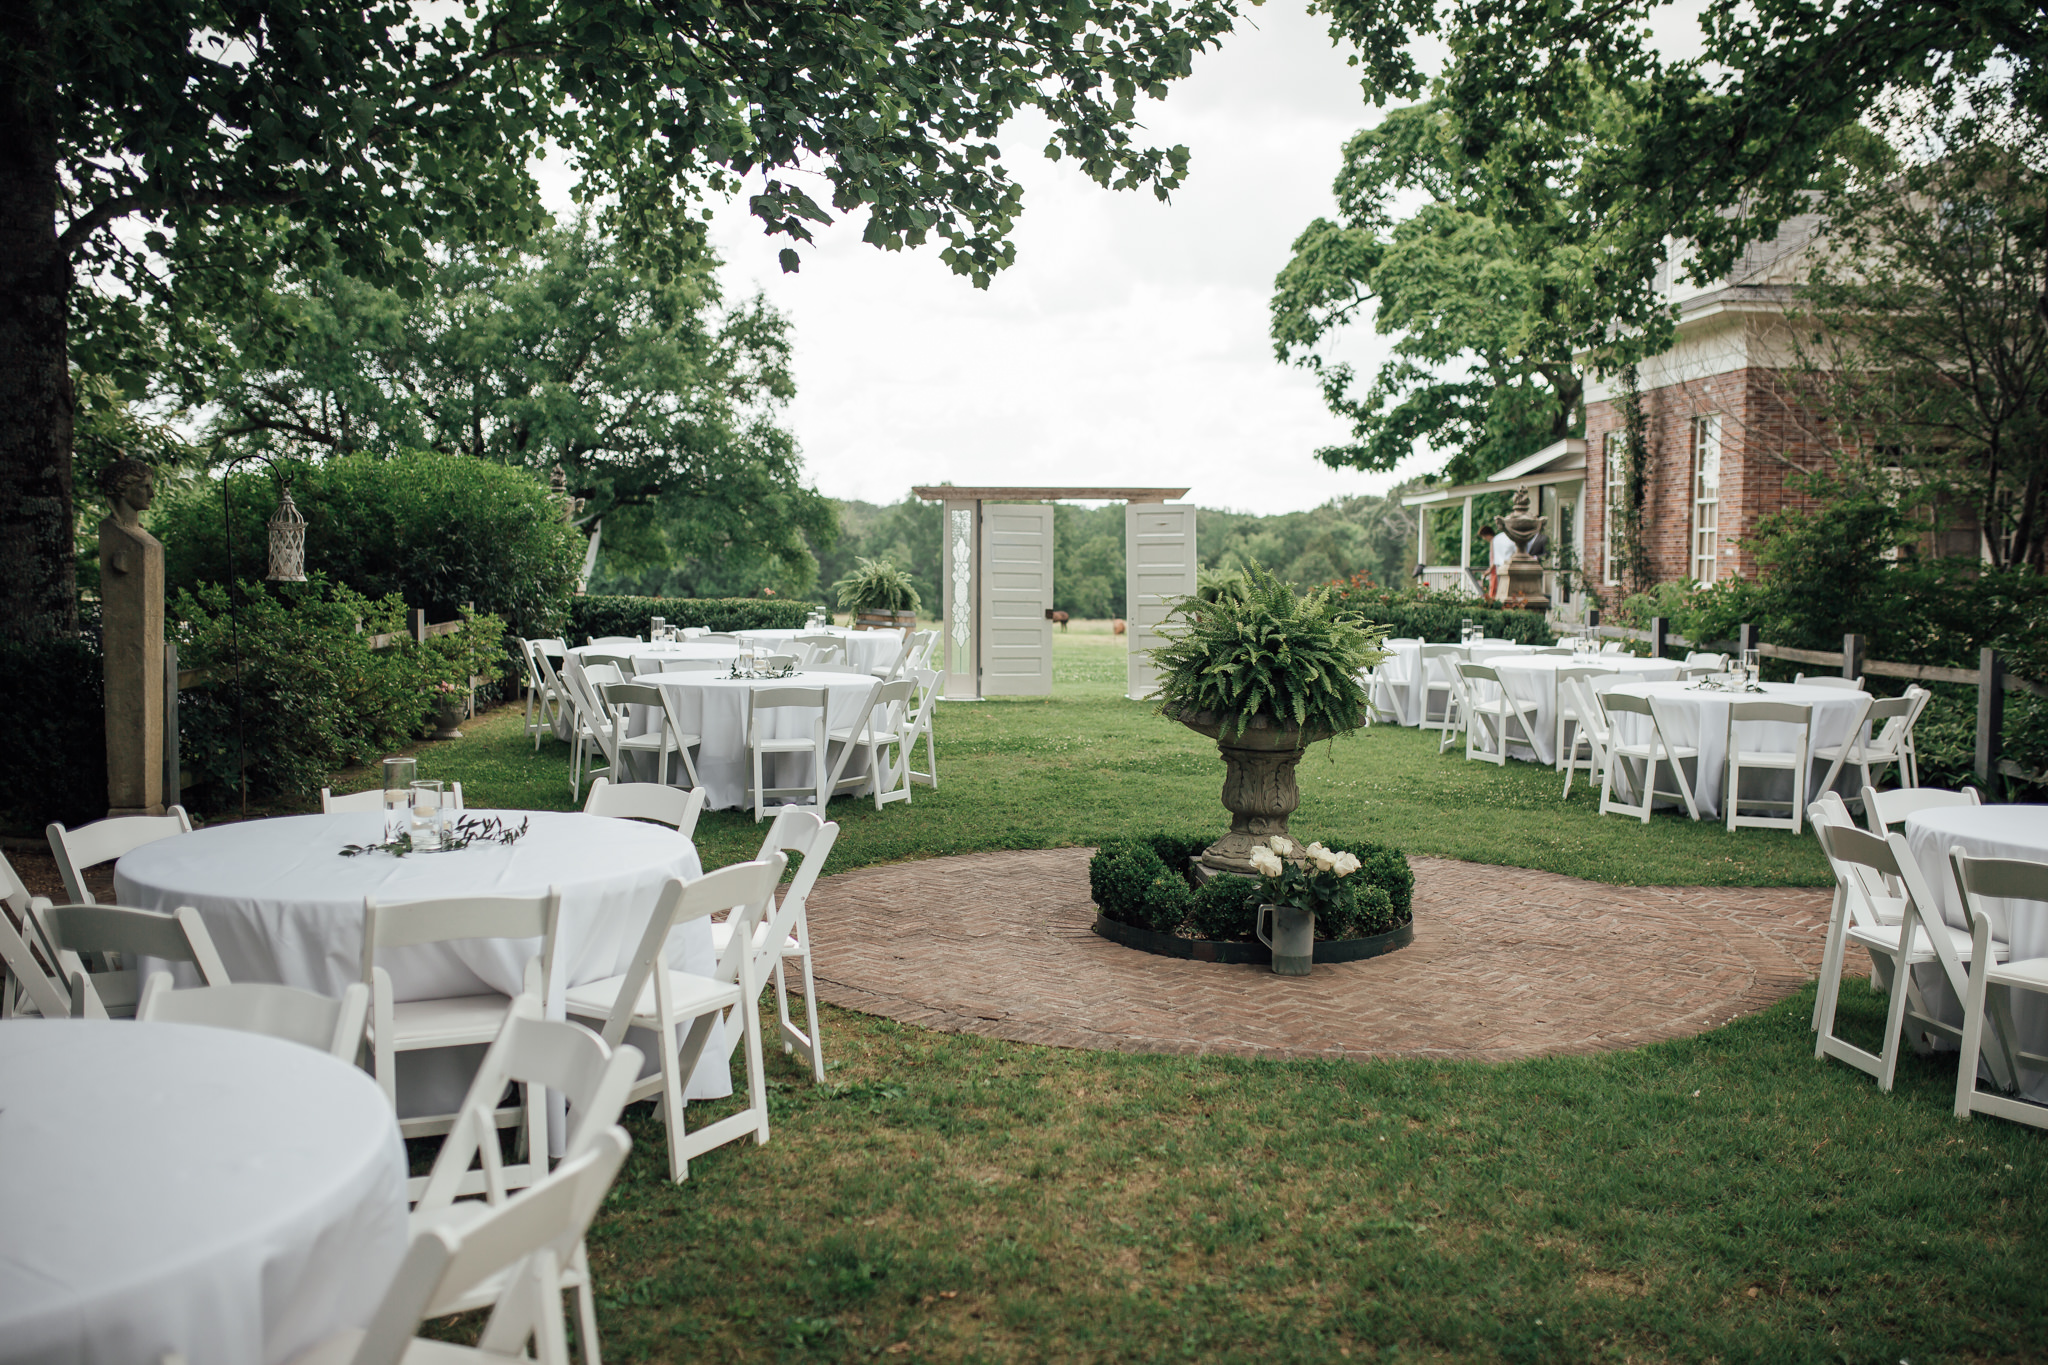 cassie-cook-photography-memphis-wedding-photographer-hedge-farm-wedding-venue-99.jpg